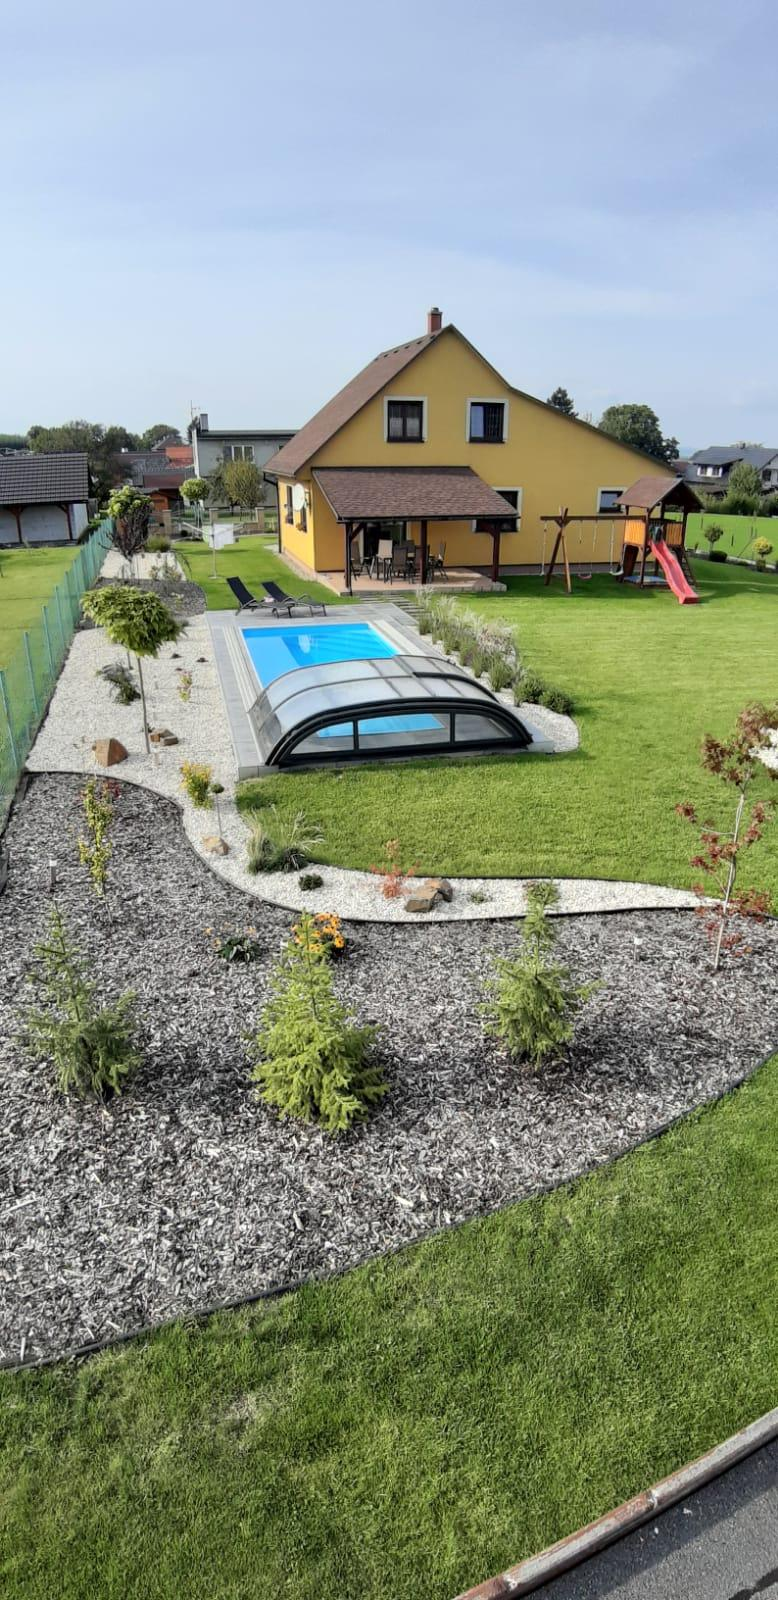 Zahrada 2020 - Obrázek č. 35